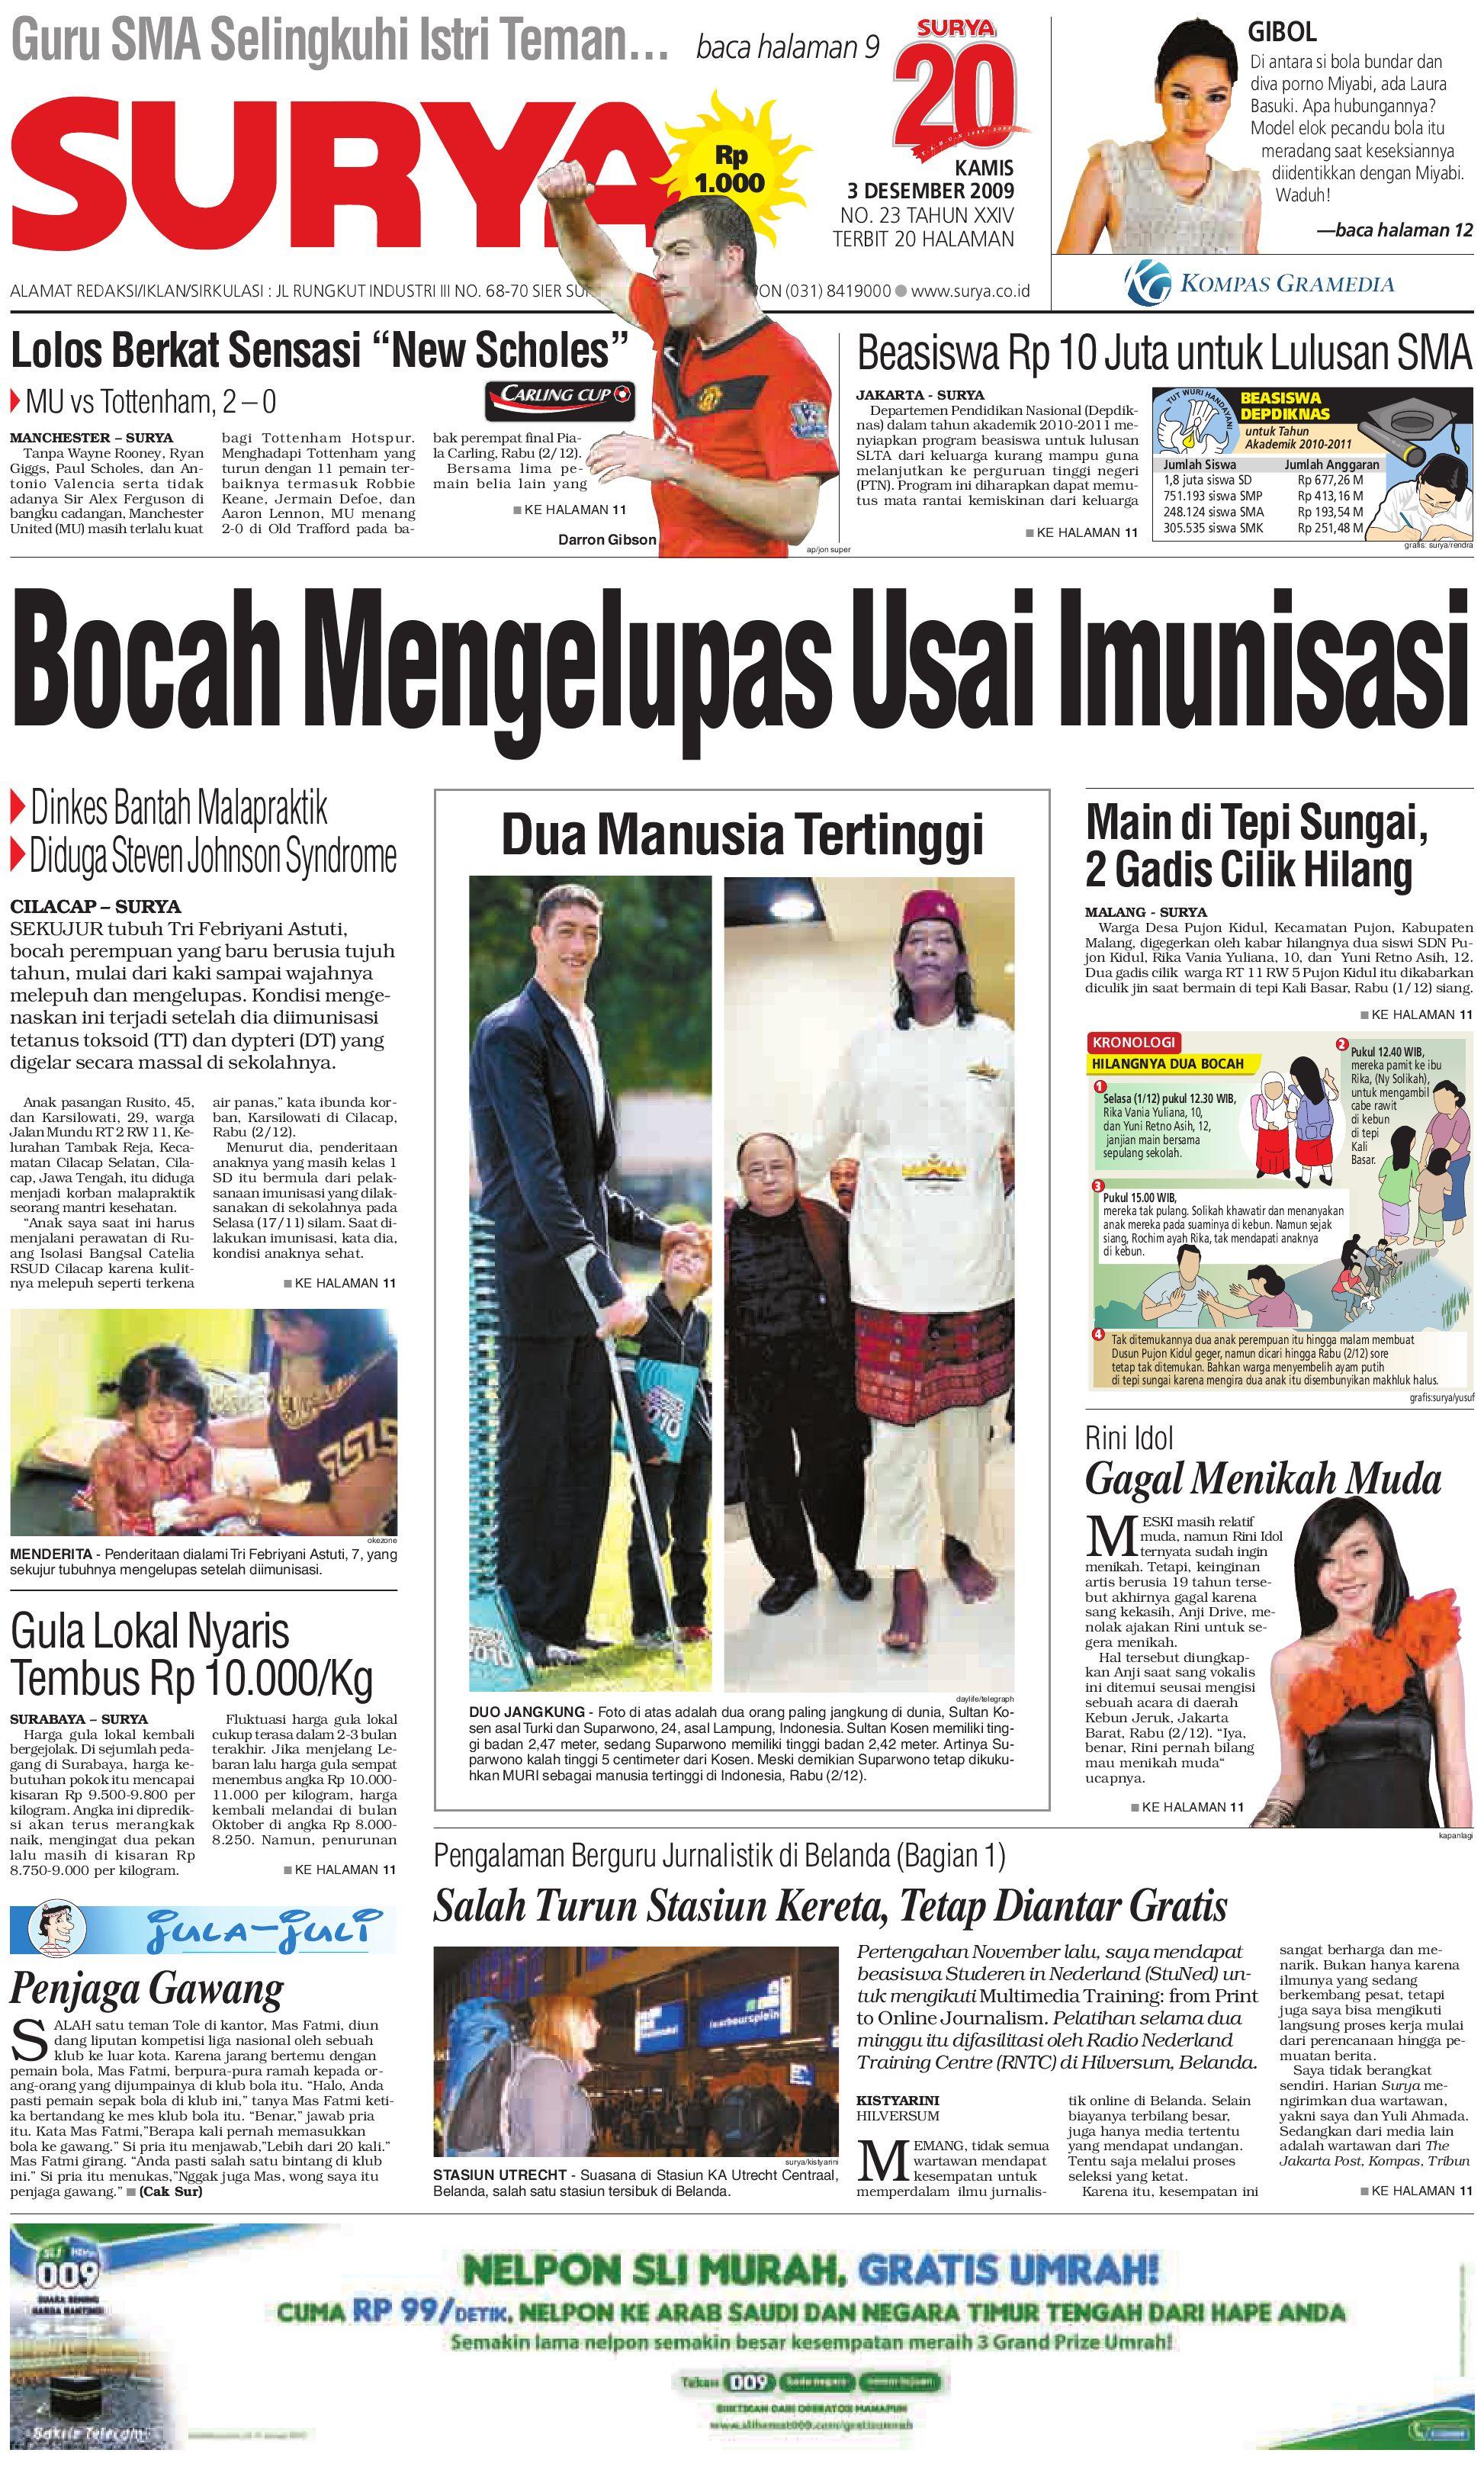 Surya Edisi Cetak 03 Des 2009 By Harian Issuu Lgs Regular Fit Kaos Casual Gambar Samar Abu Muda L